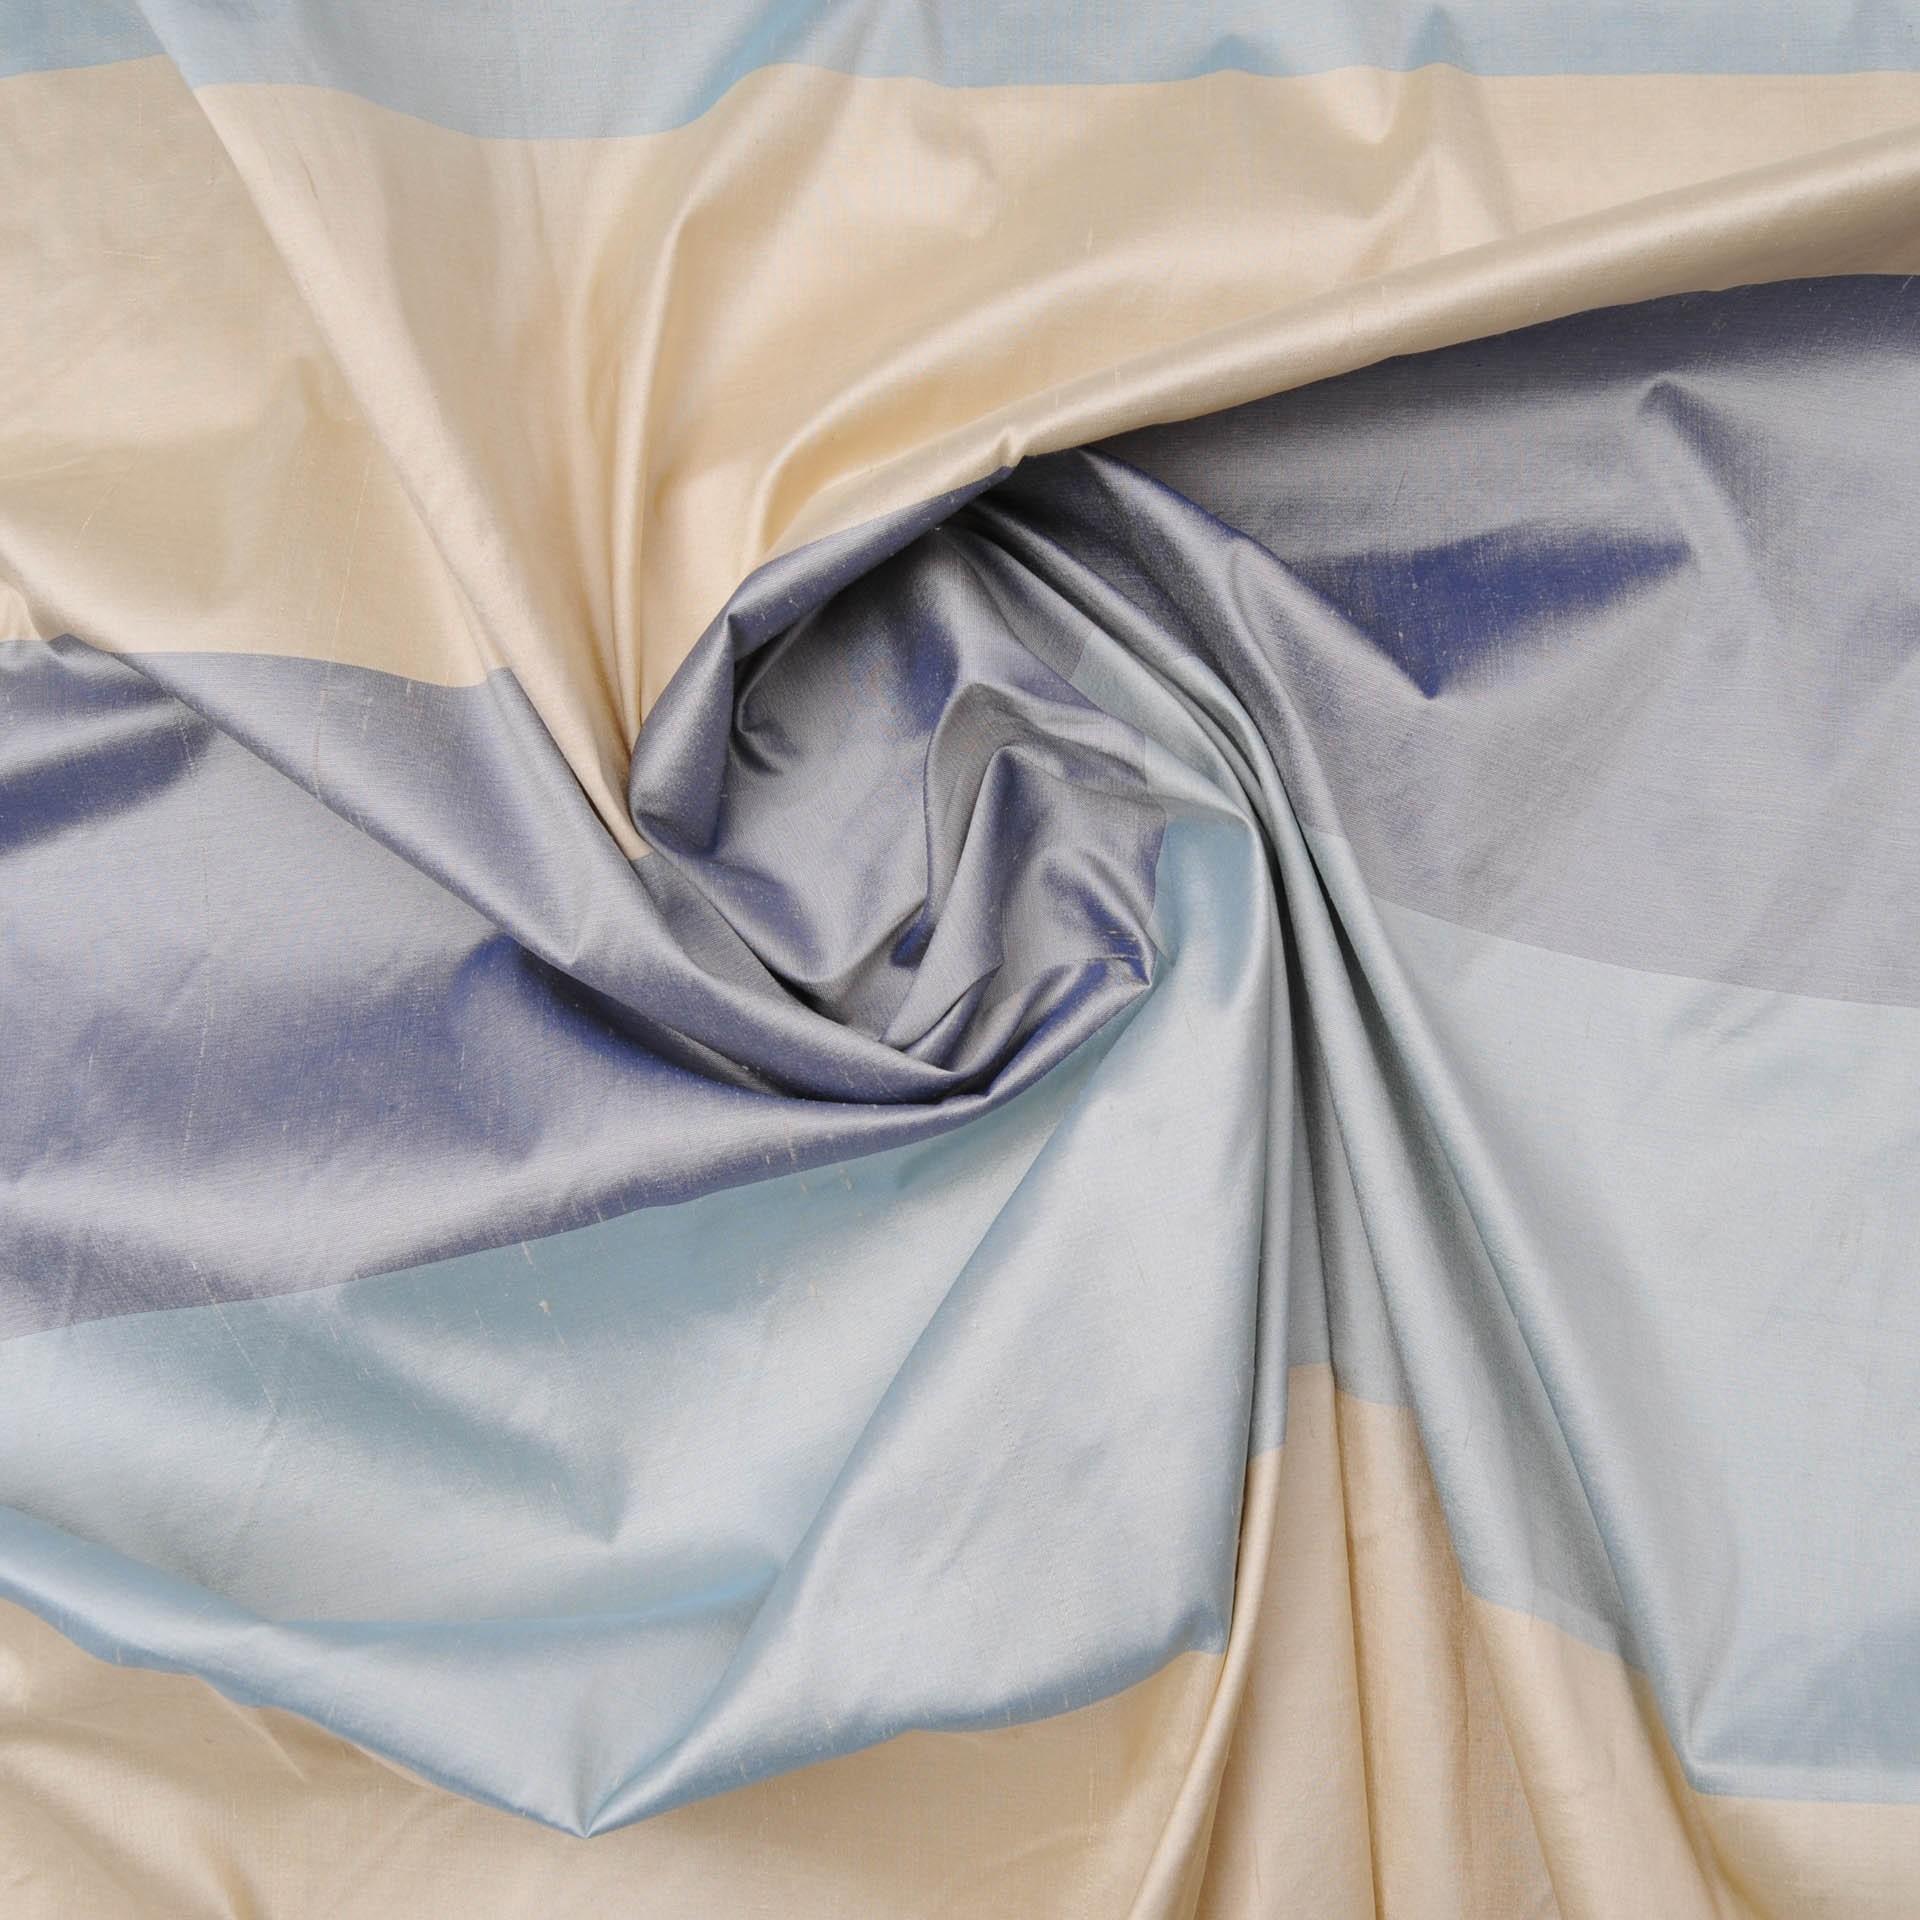 tissu au m tre toile polyester satin e rayures en 140cm n 729 defilentissus. Black Bedroom Furniture Sets. Home Design Ideas